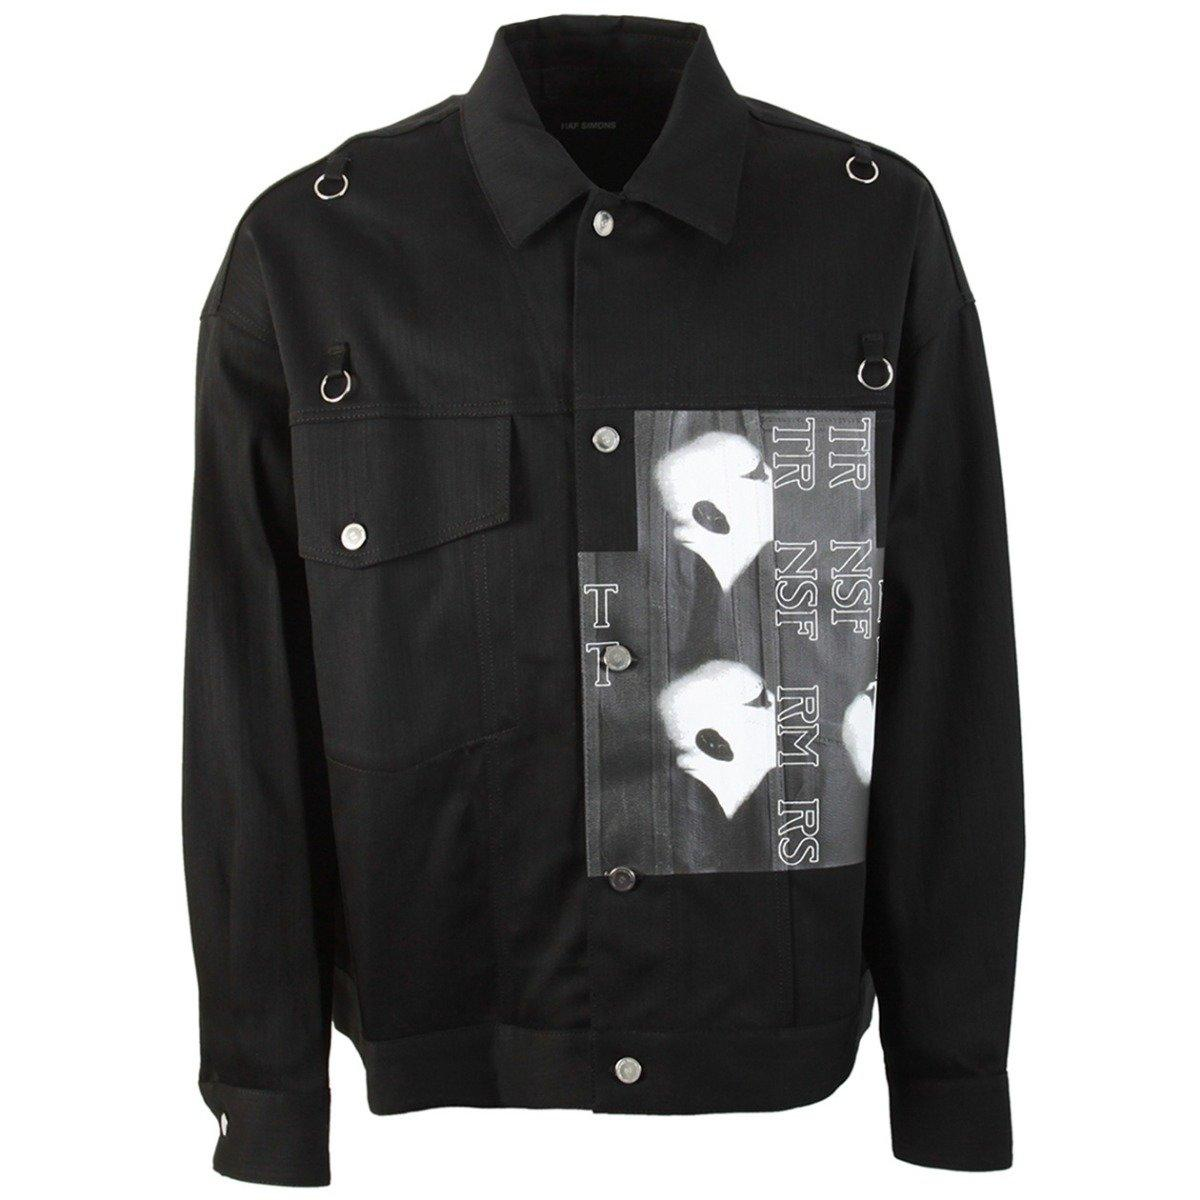 6d5a4786c8d Lyst - Raf Simons Black Denim Oversized Head Jacket in Black - Save 12%